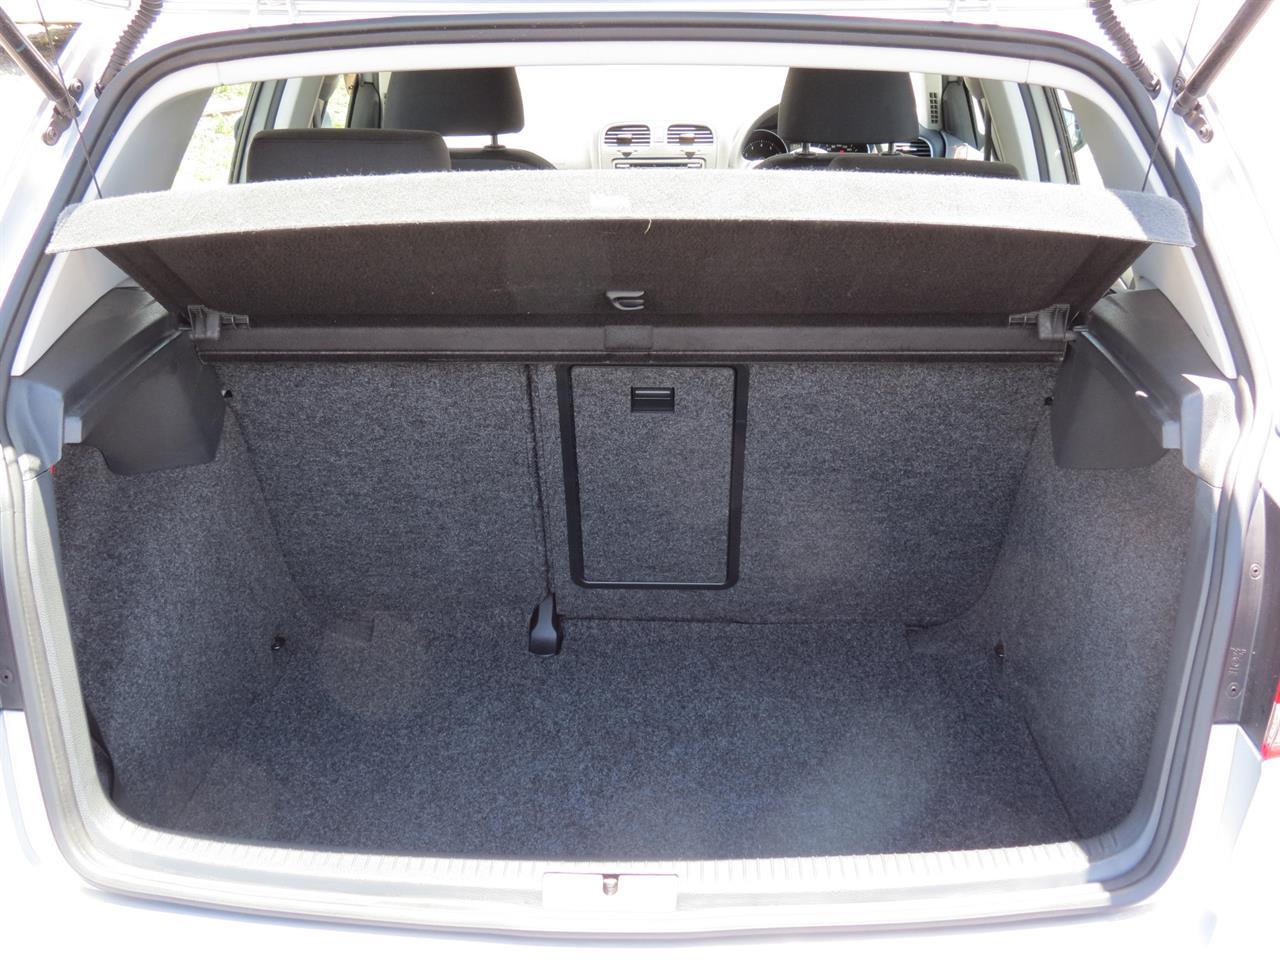 2011 Volkswagen Golf | only $31 weekly